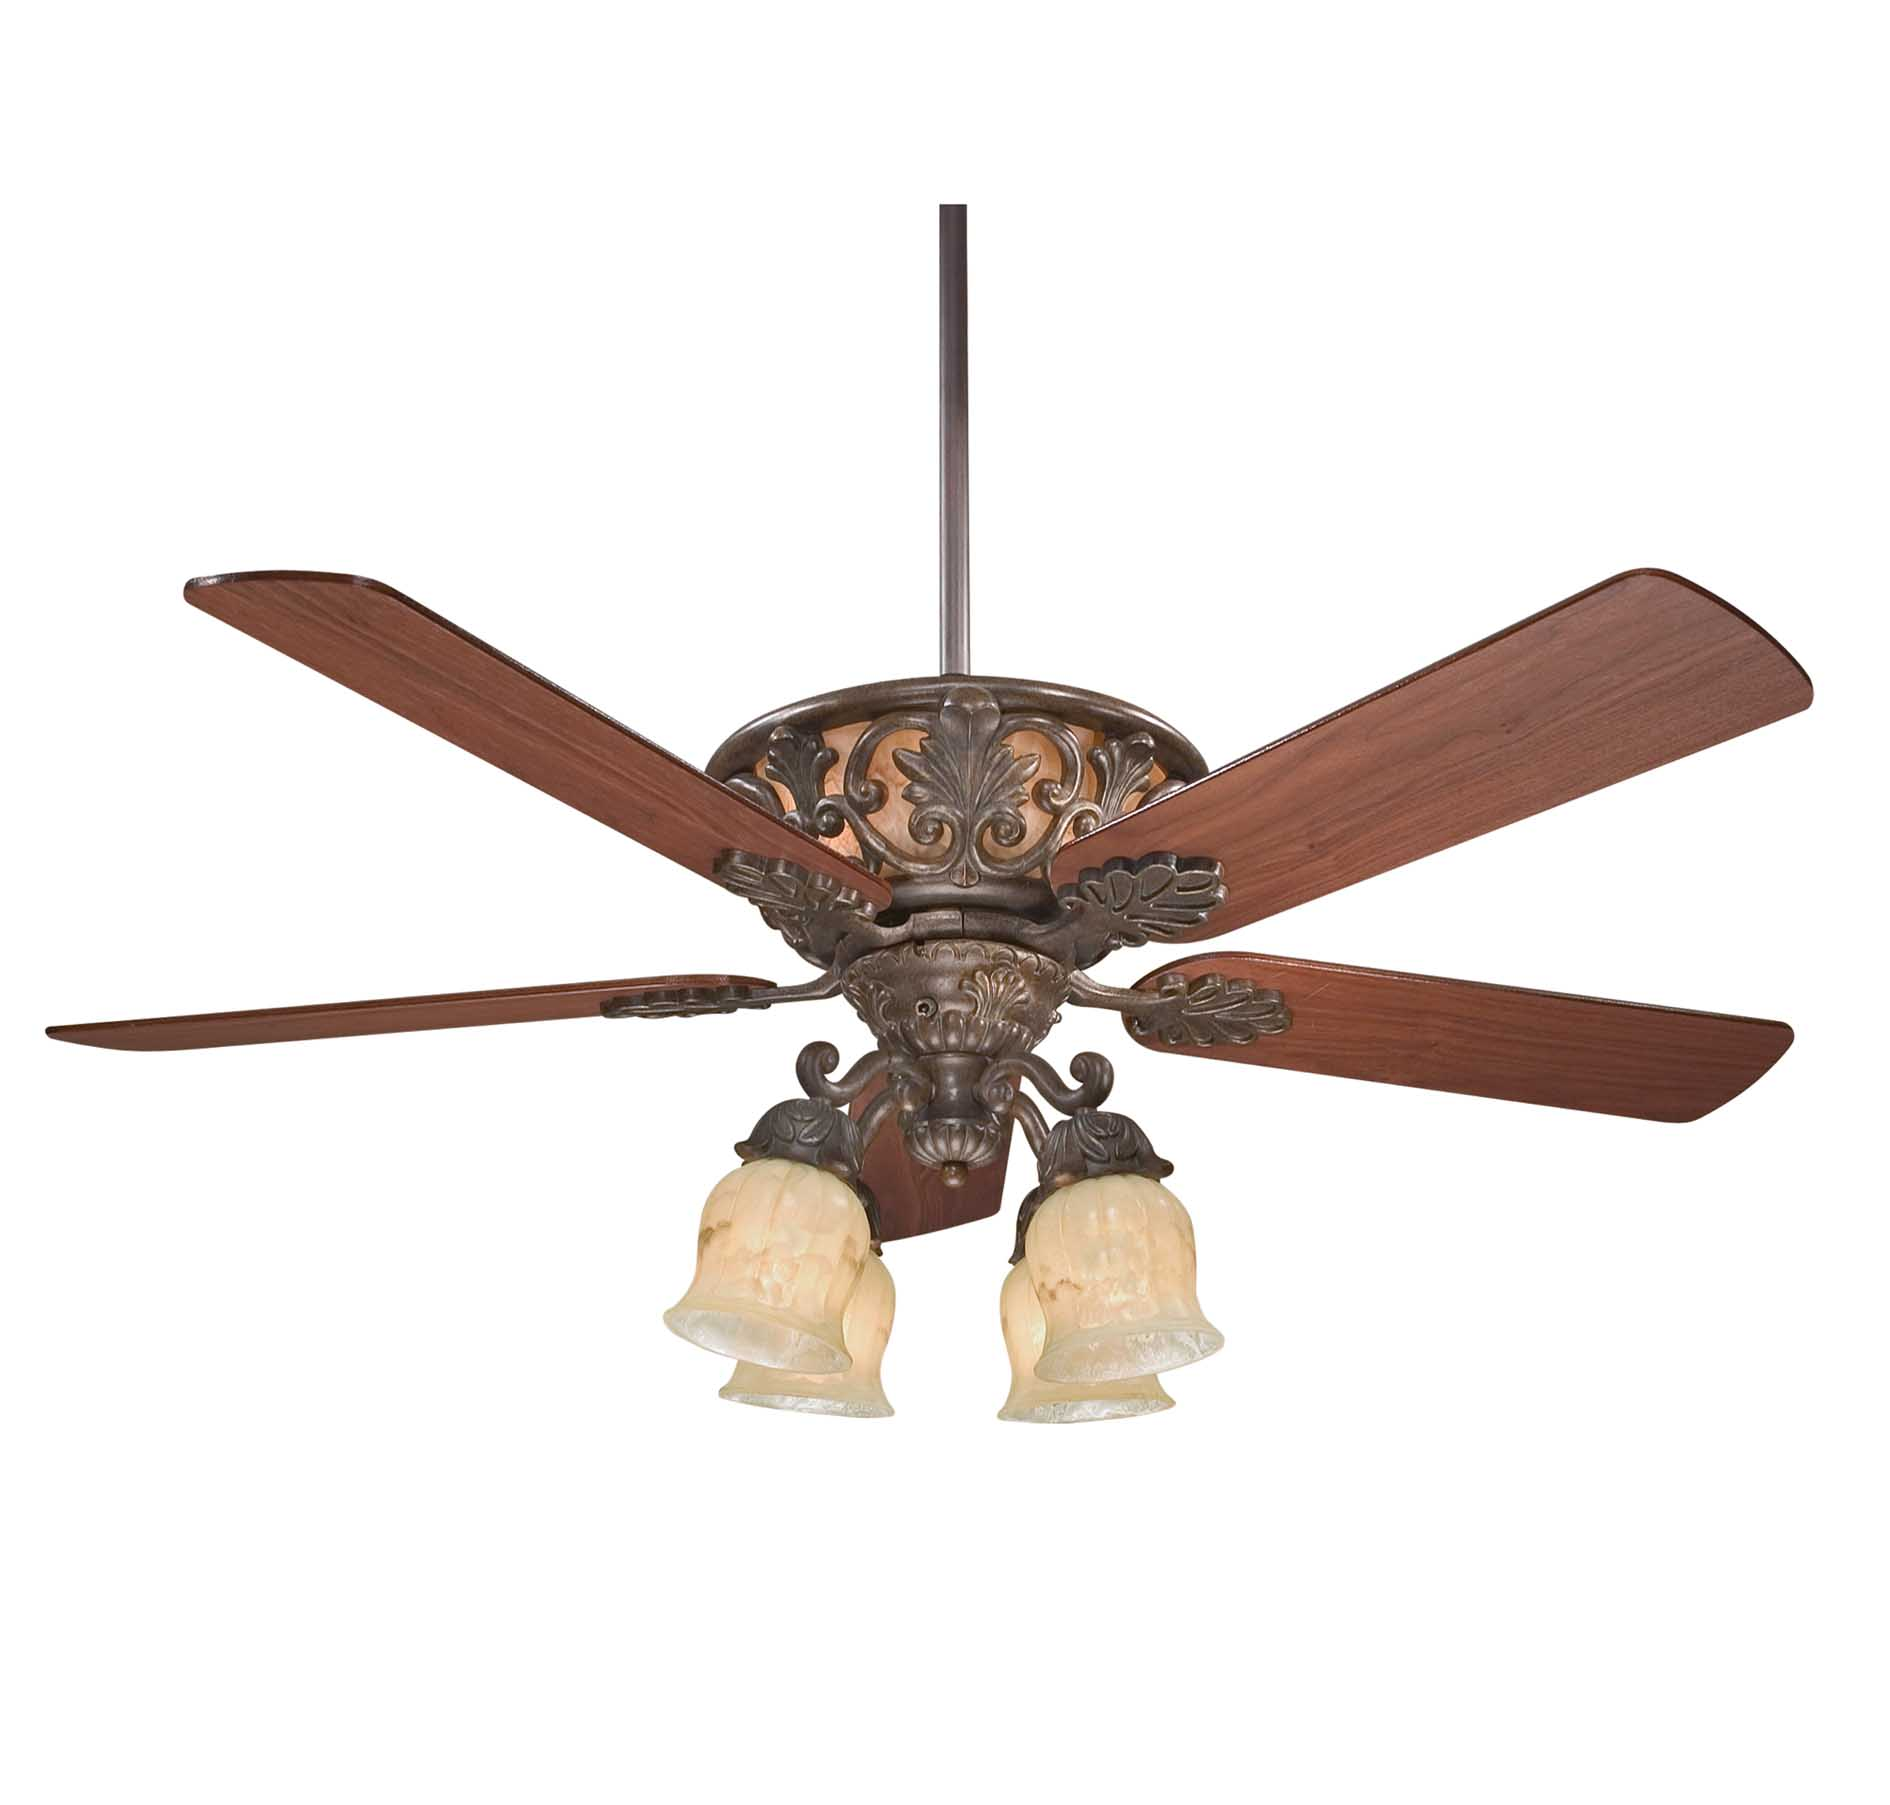 Monarch ceiling fan by savoy house 52 810 5wa 40 monarch ceiling fan by savoy house aloadofball Gallery